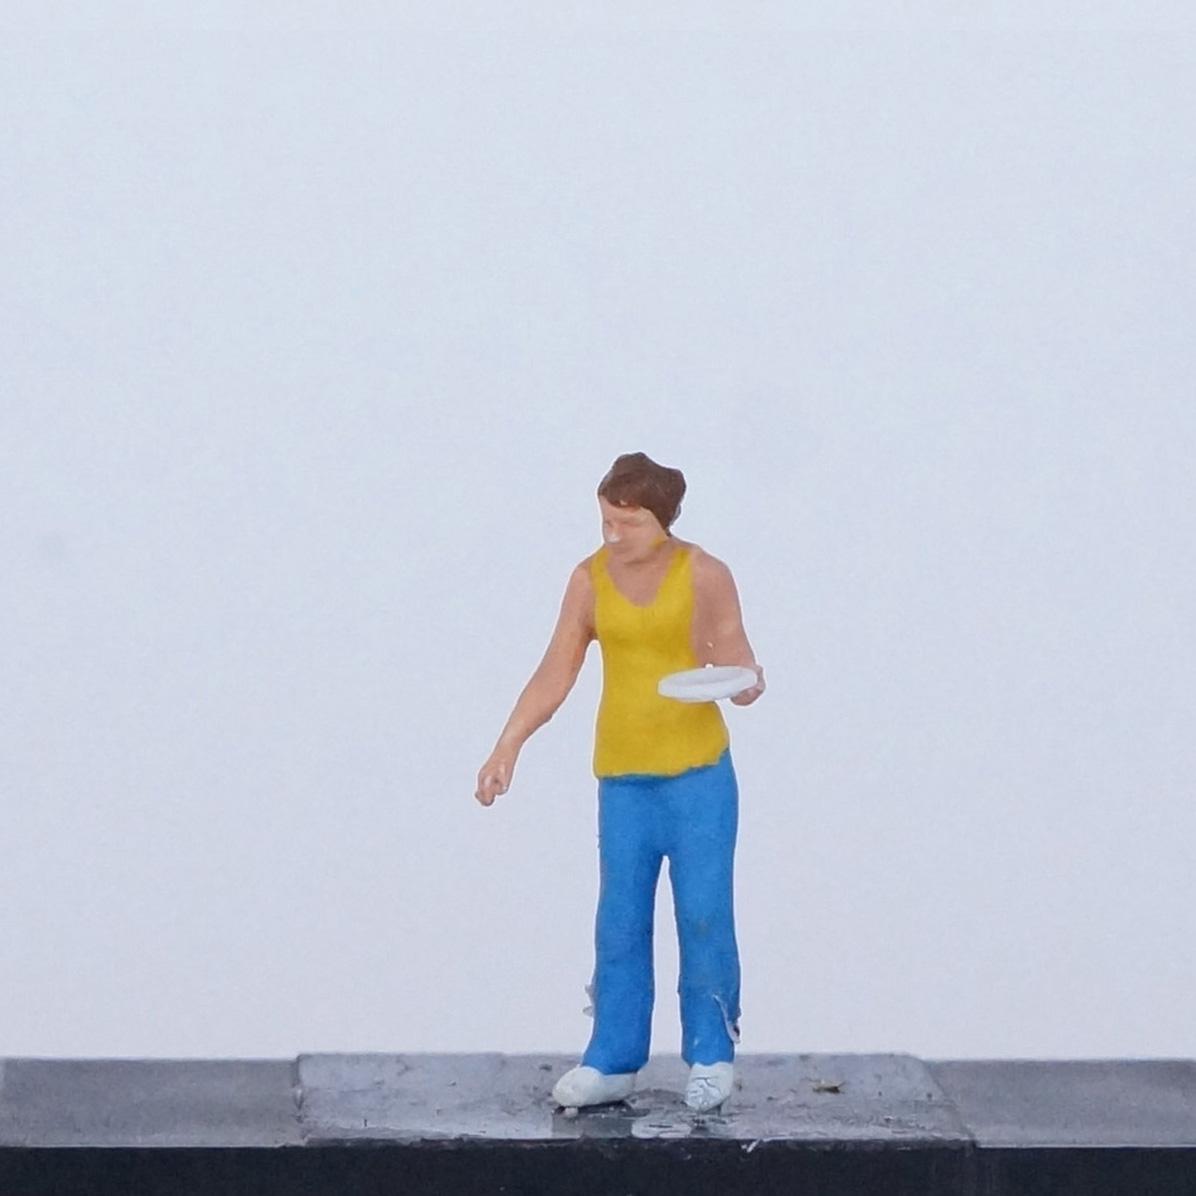 Frau in gelbem Shirt